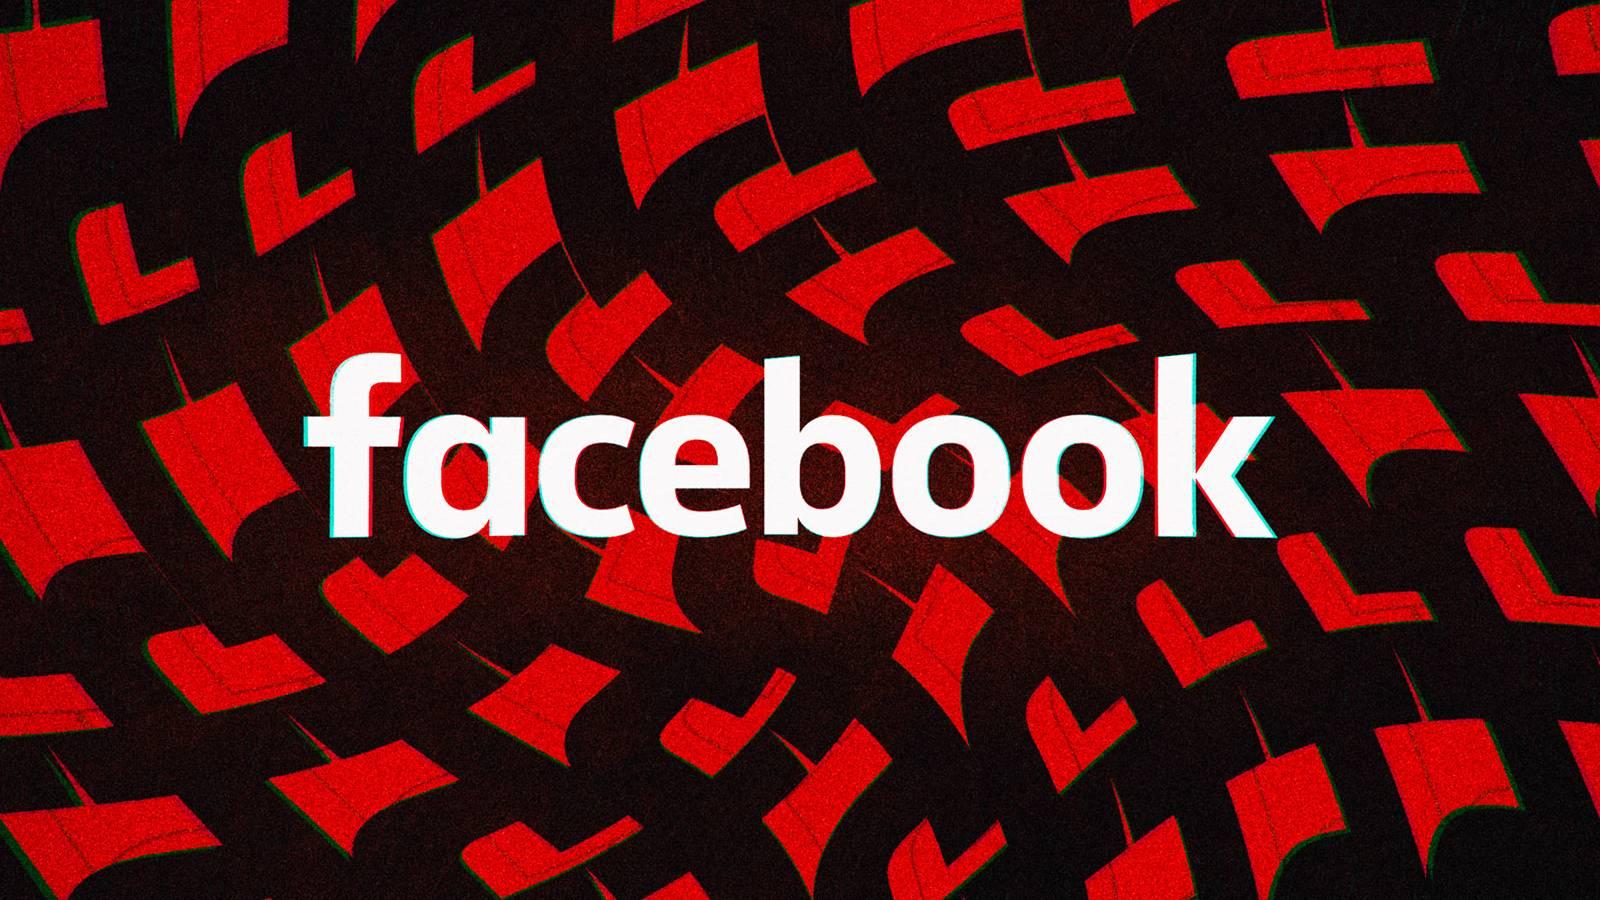 facebook delogat aplicatie iphone